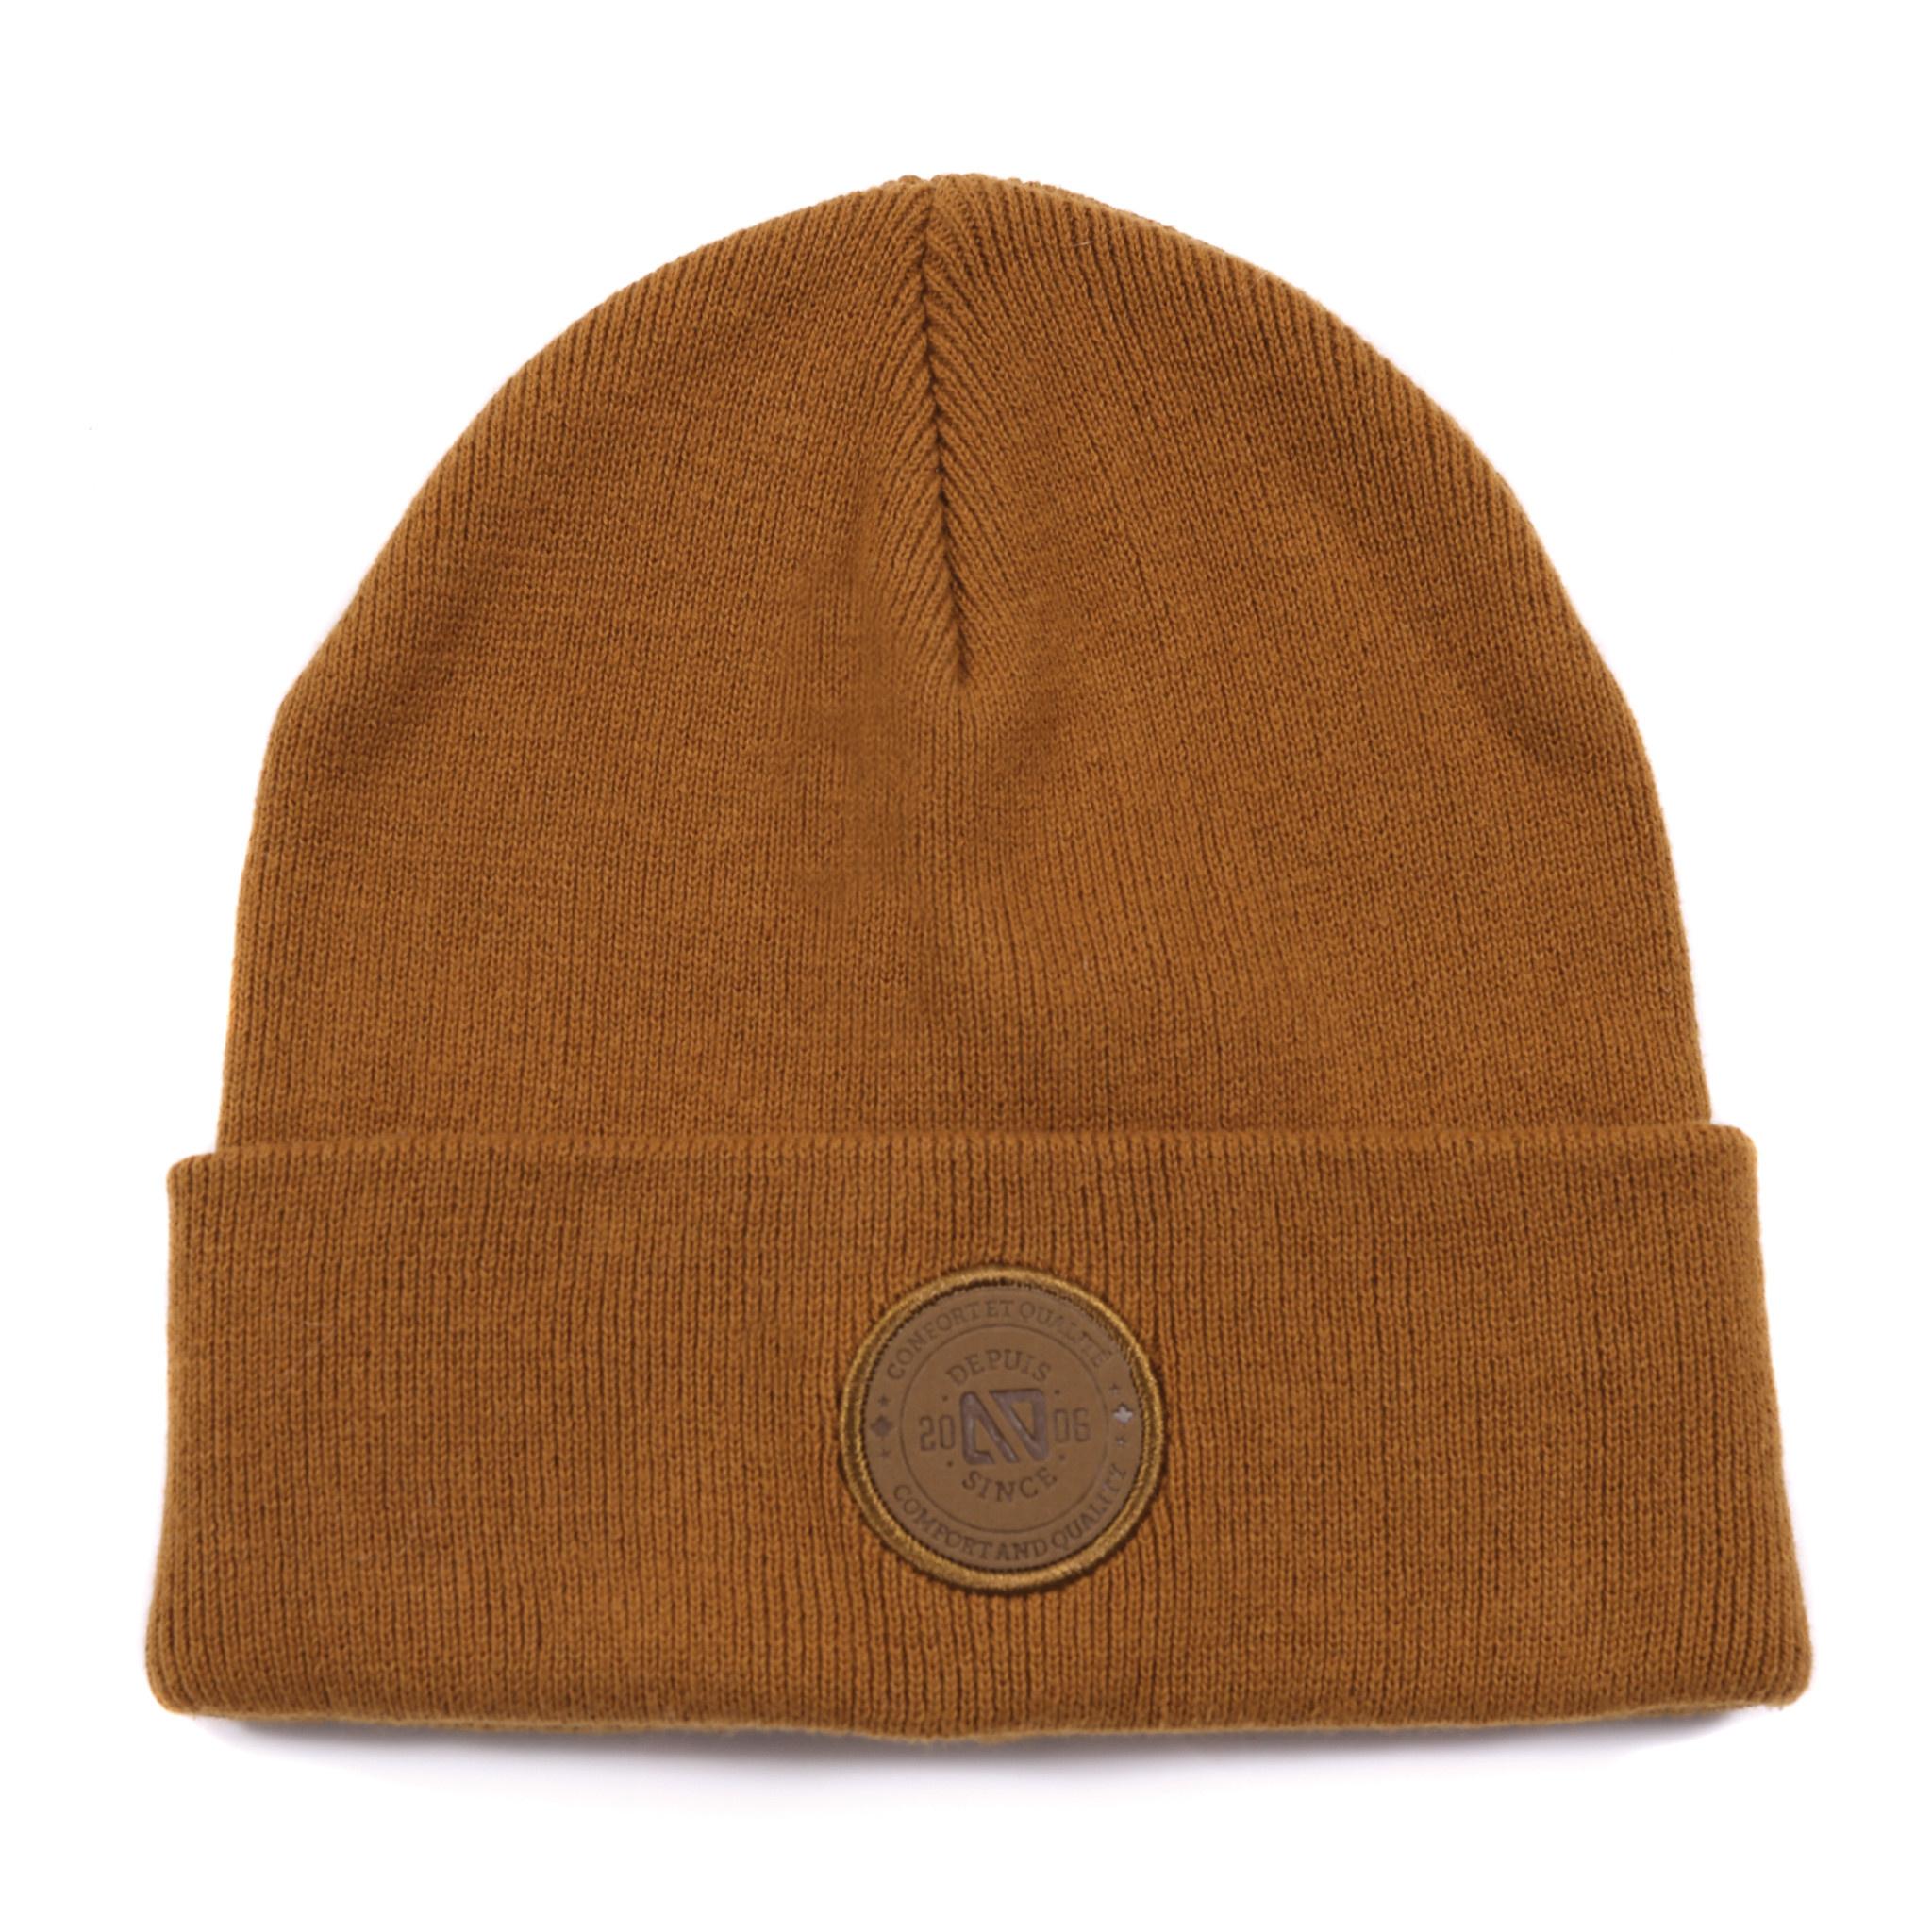 Tuque en tricot Taupe-1